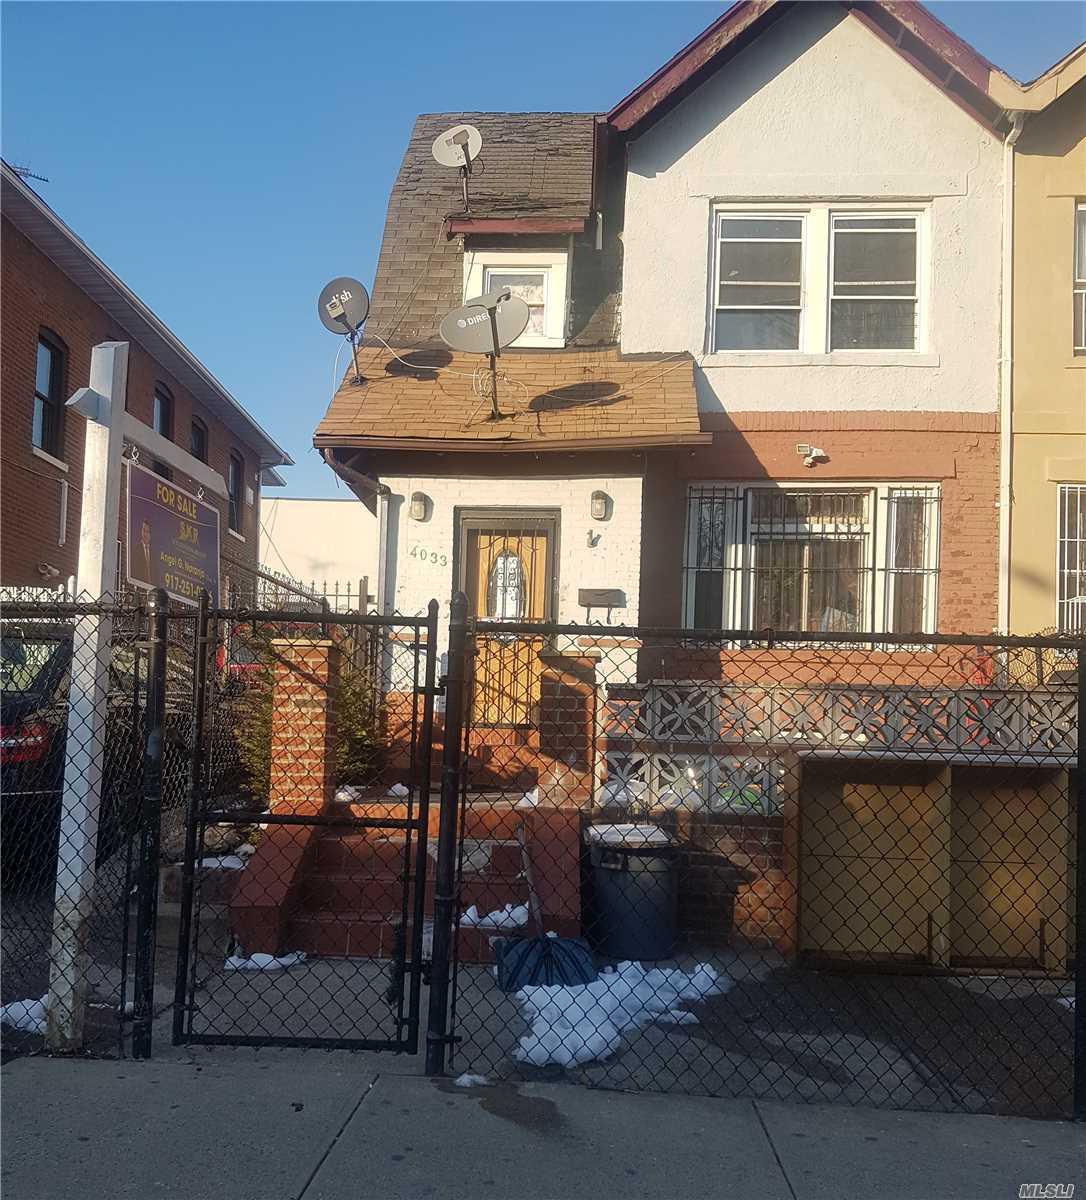 40-33 Forley St Elmhurst, NY 11373